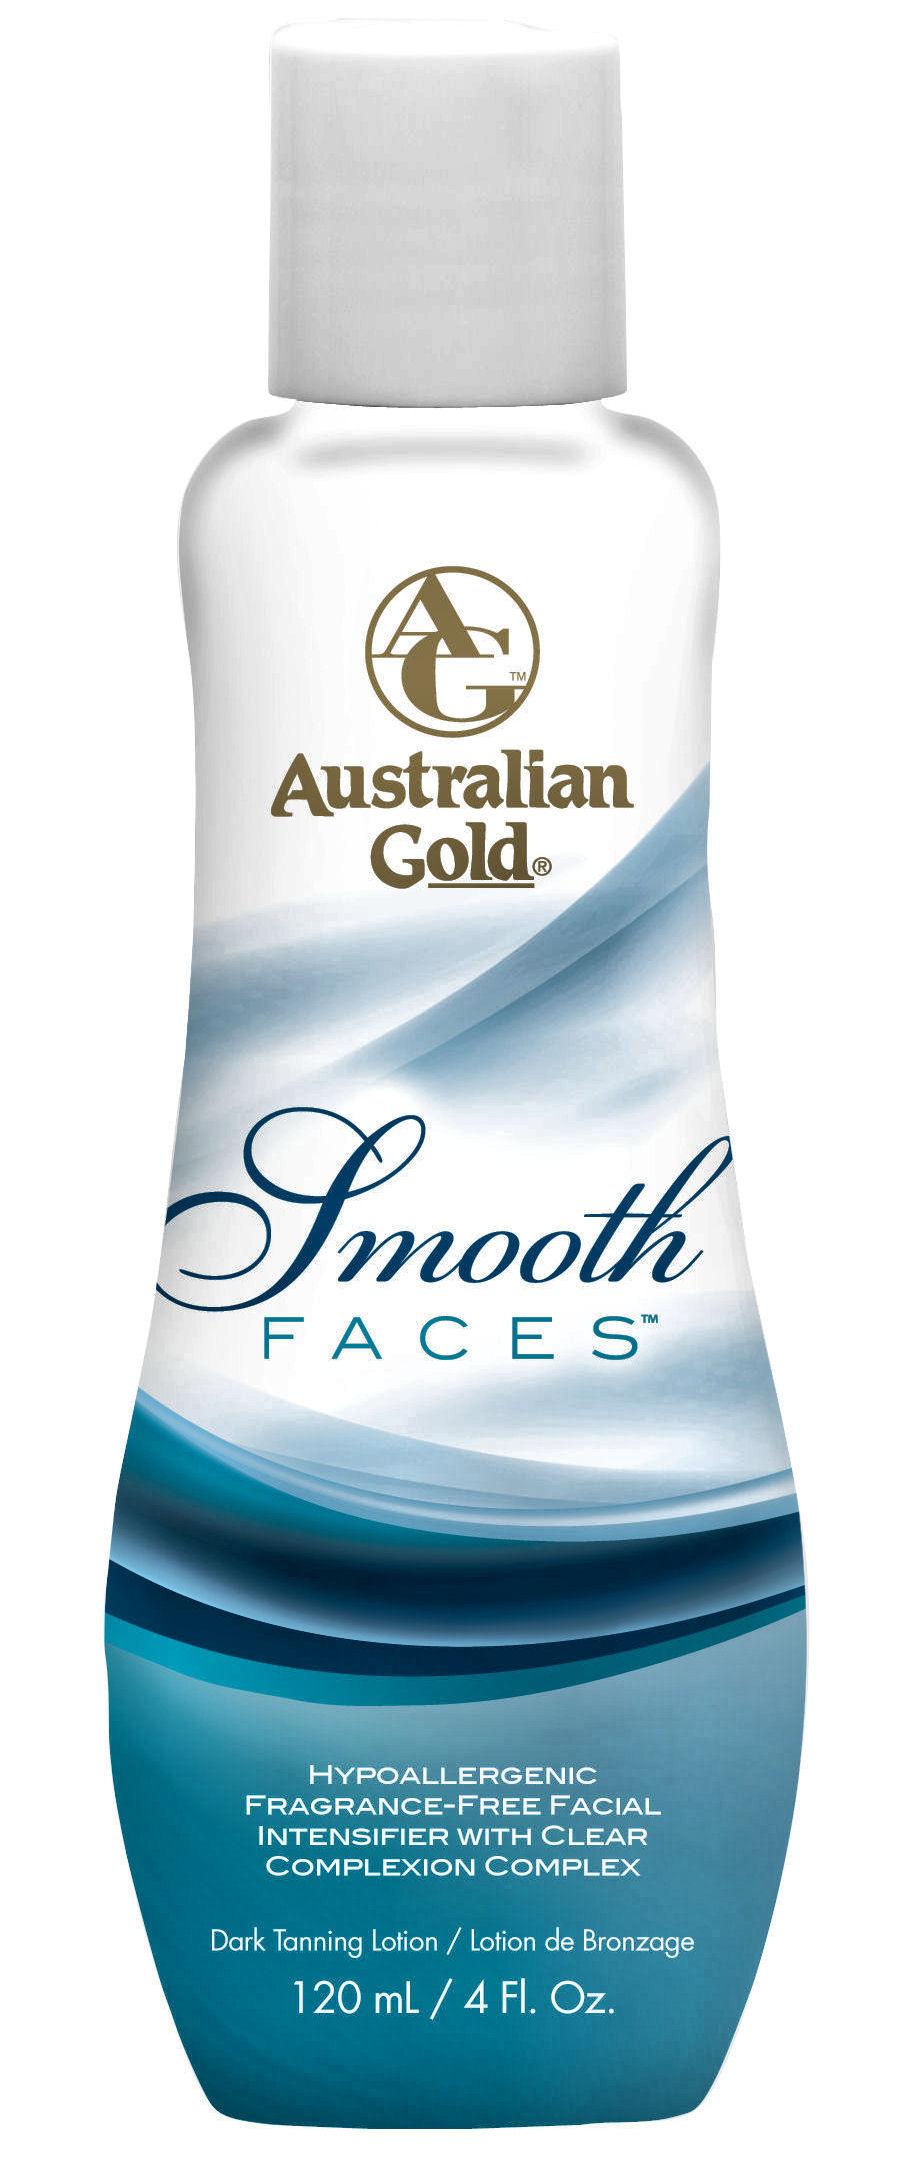 Smooth Faces™ Hypoallergenic Facial Intensifier